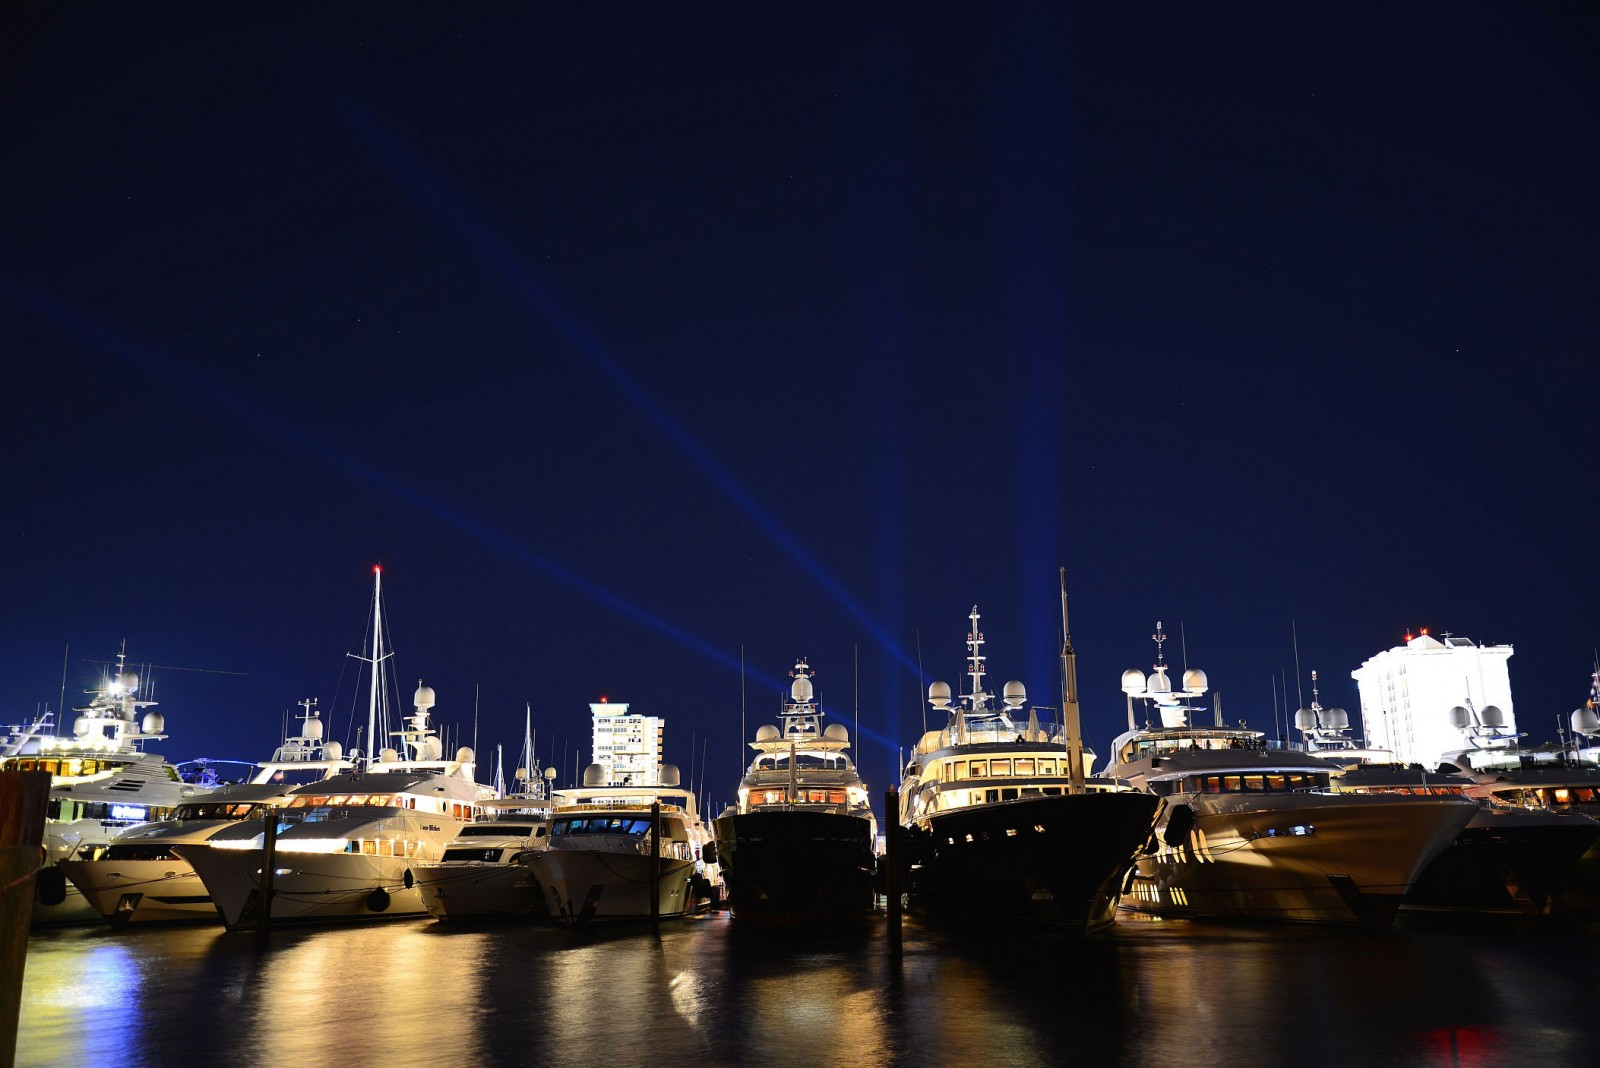 STOCK-backlight-night-yachtFLIBS